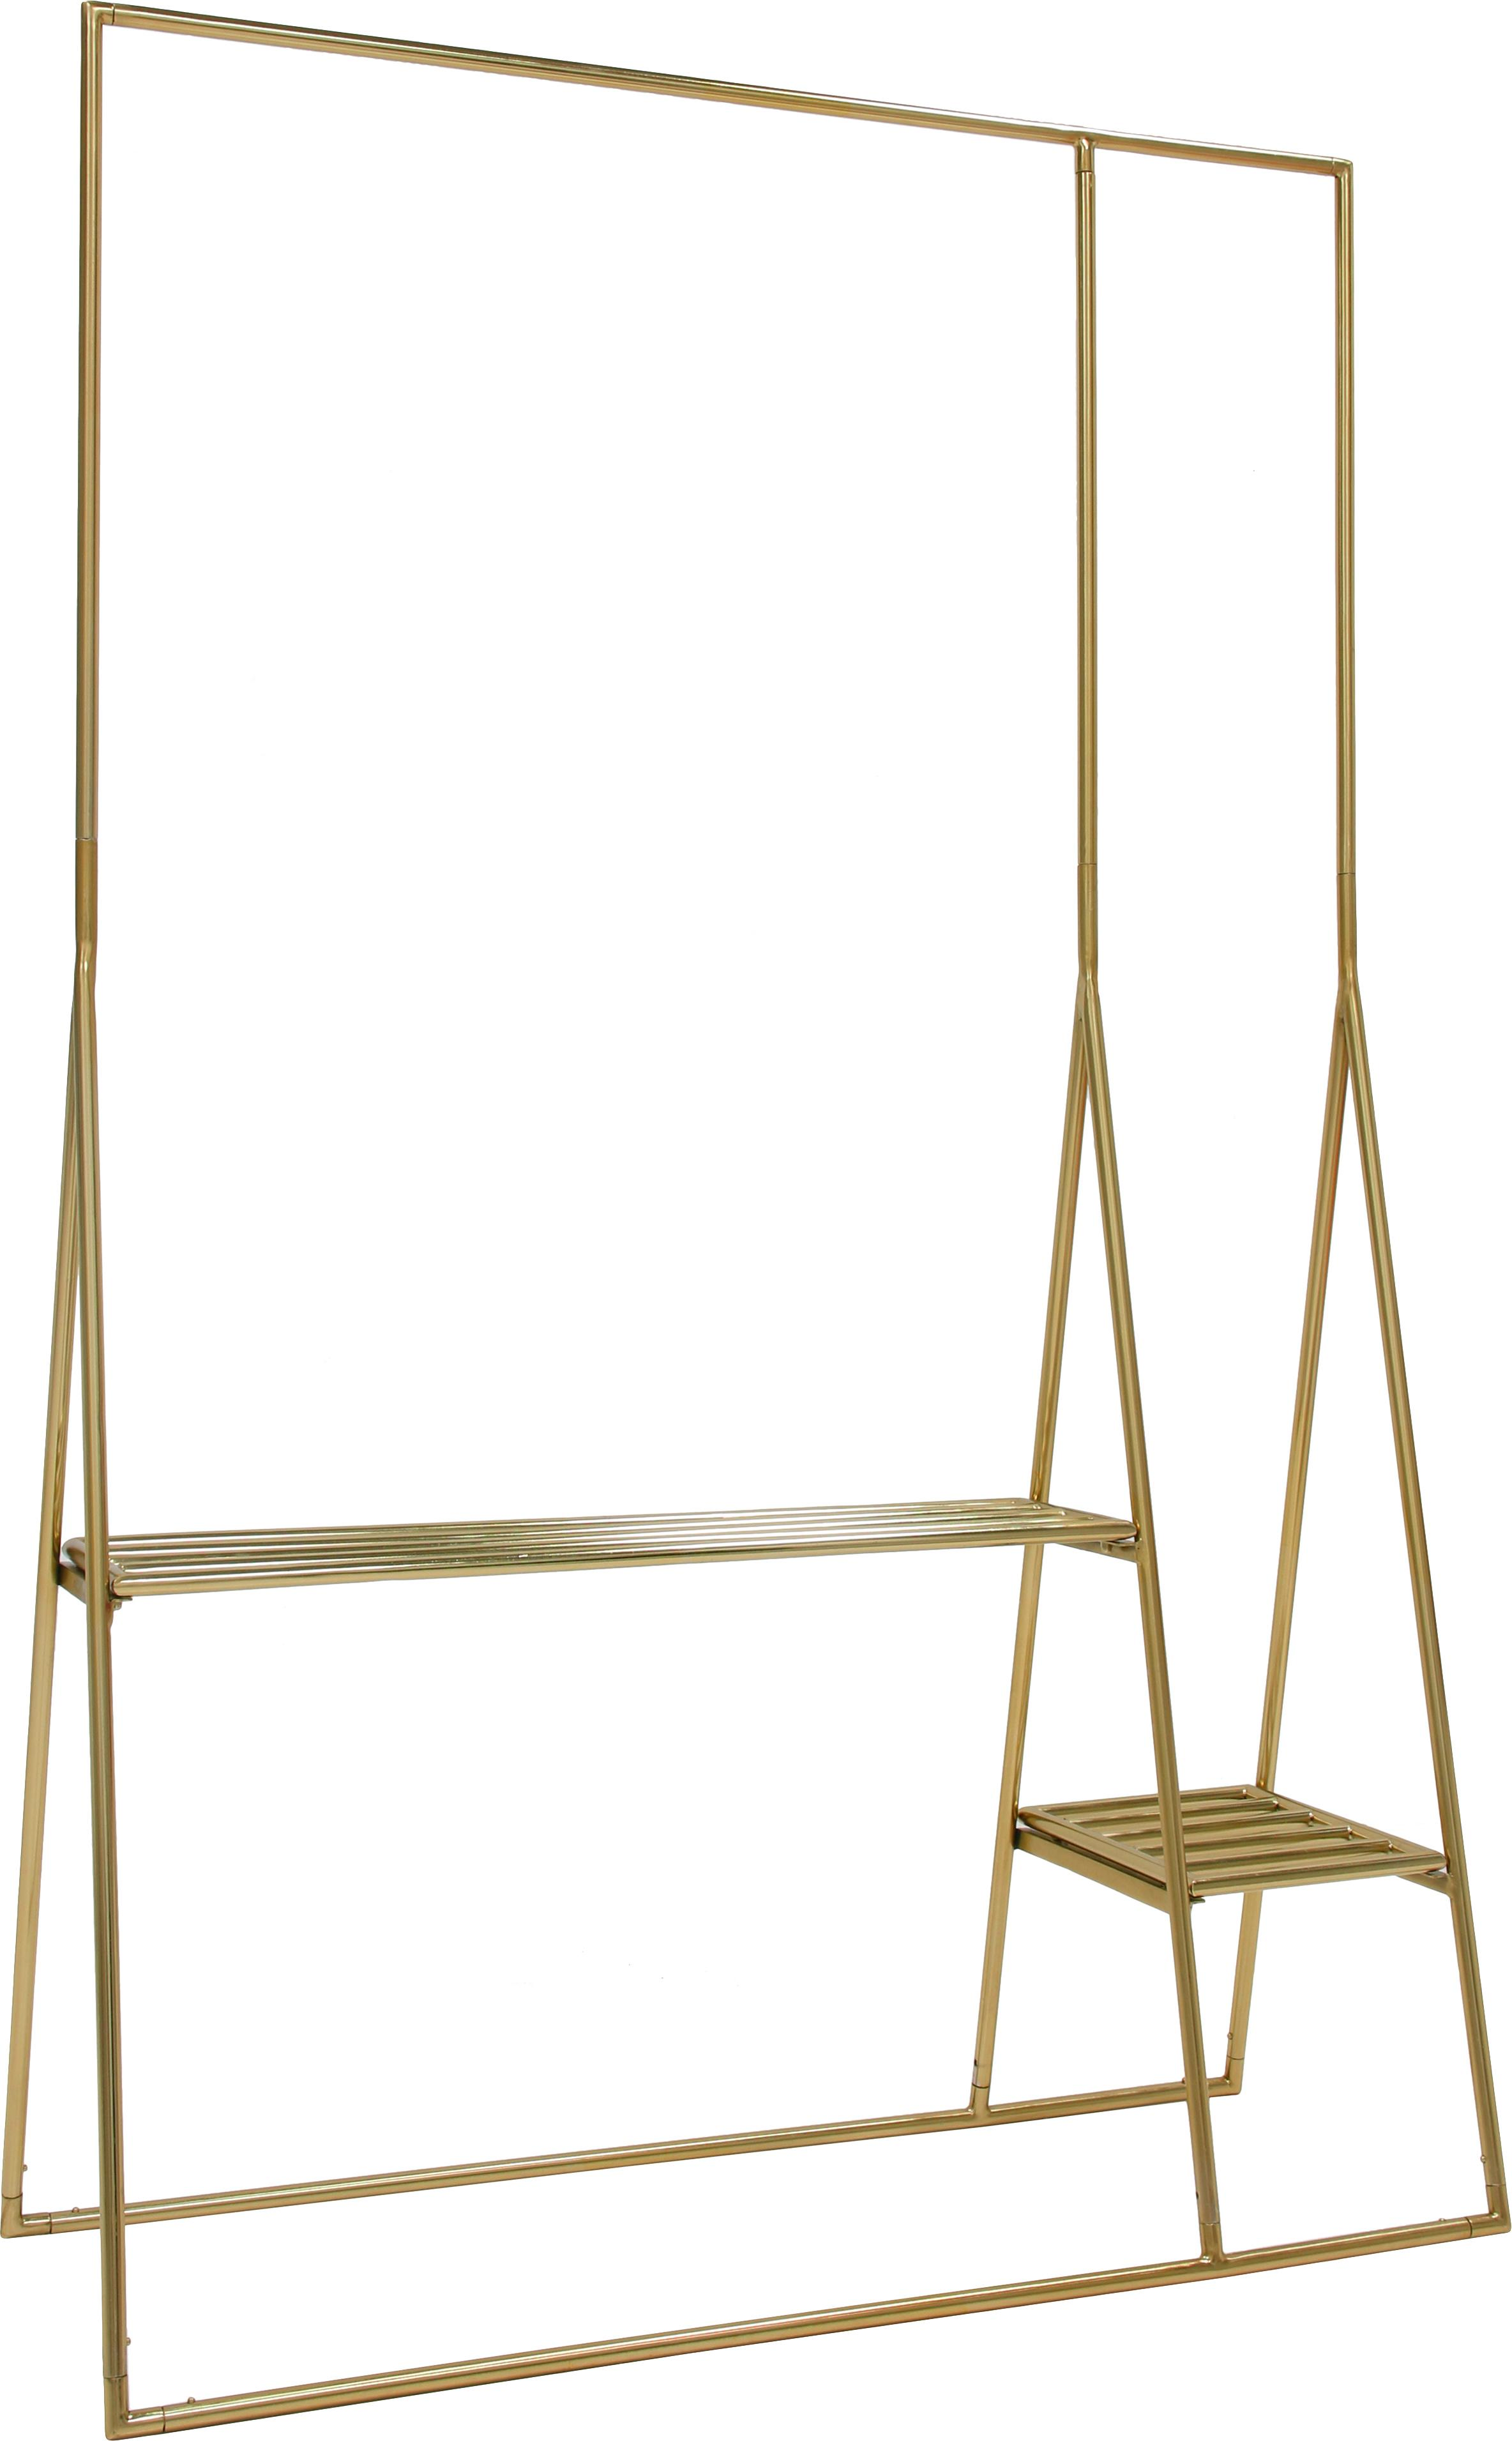 Kledingrek Stacker, Gecoat metaal, Messingkleurig, 125 x 190 cm